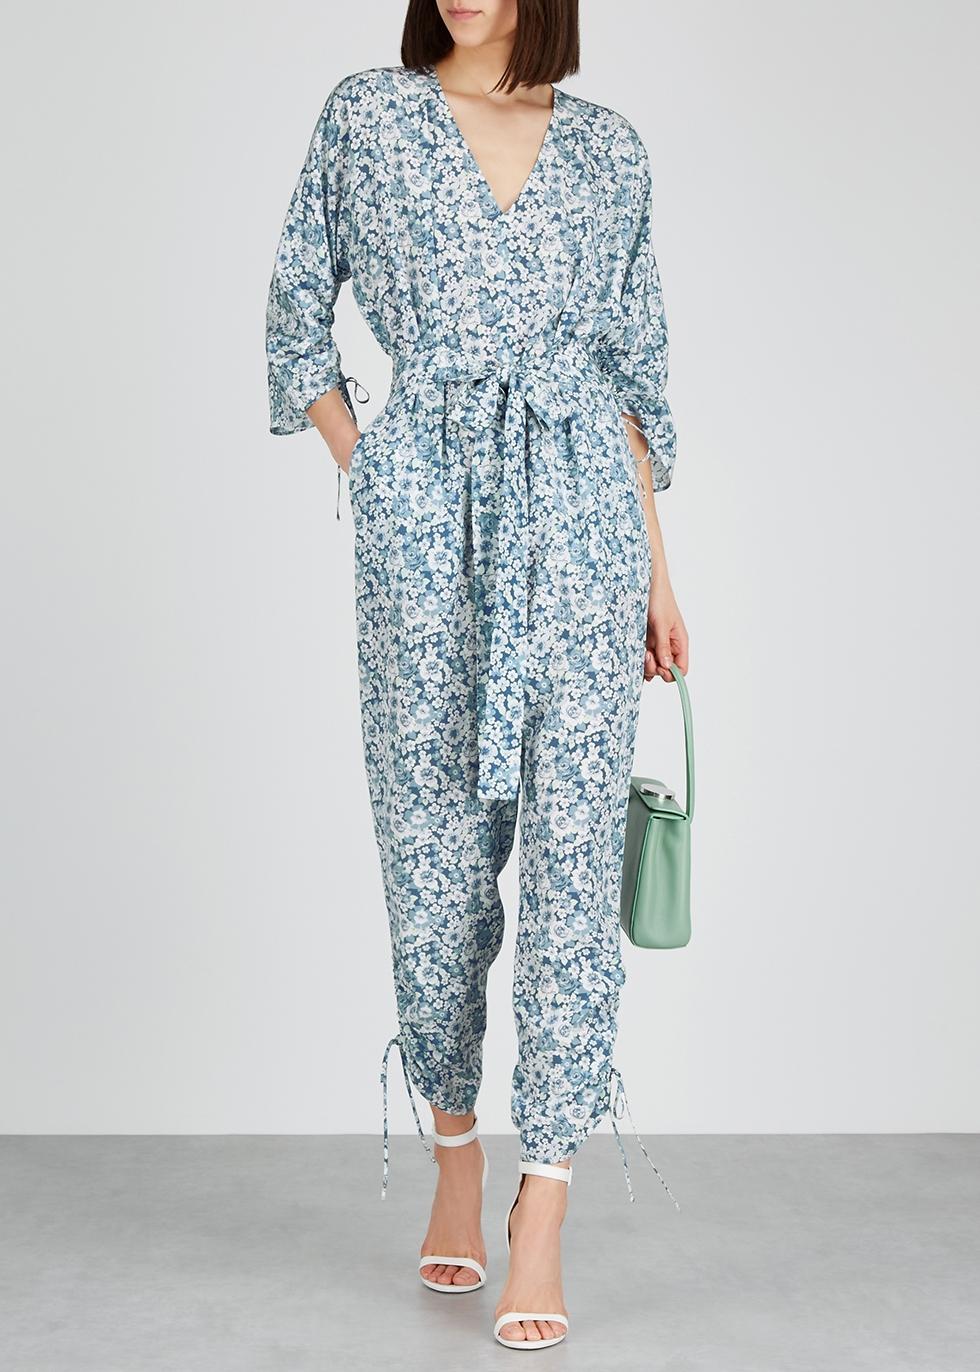 Floral-print silk jumpsuit - Stella McCartney